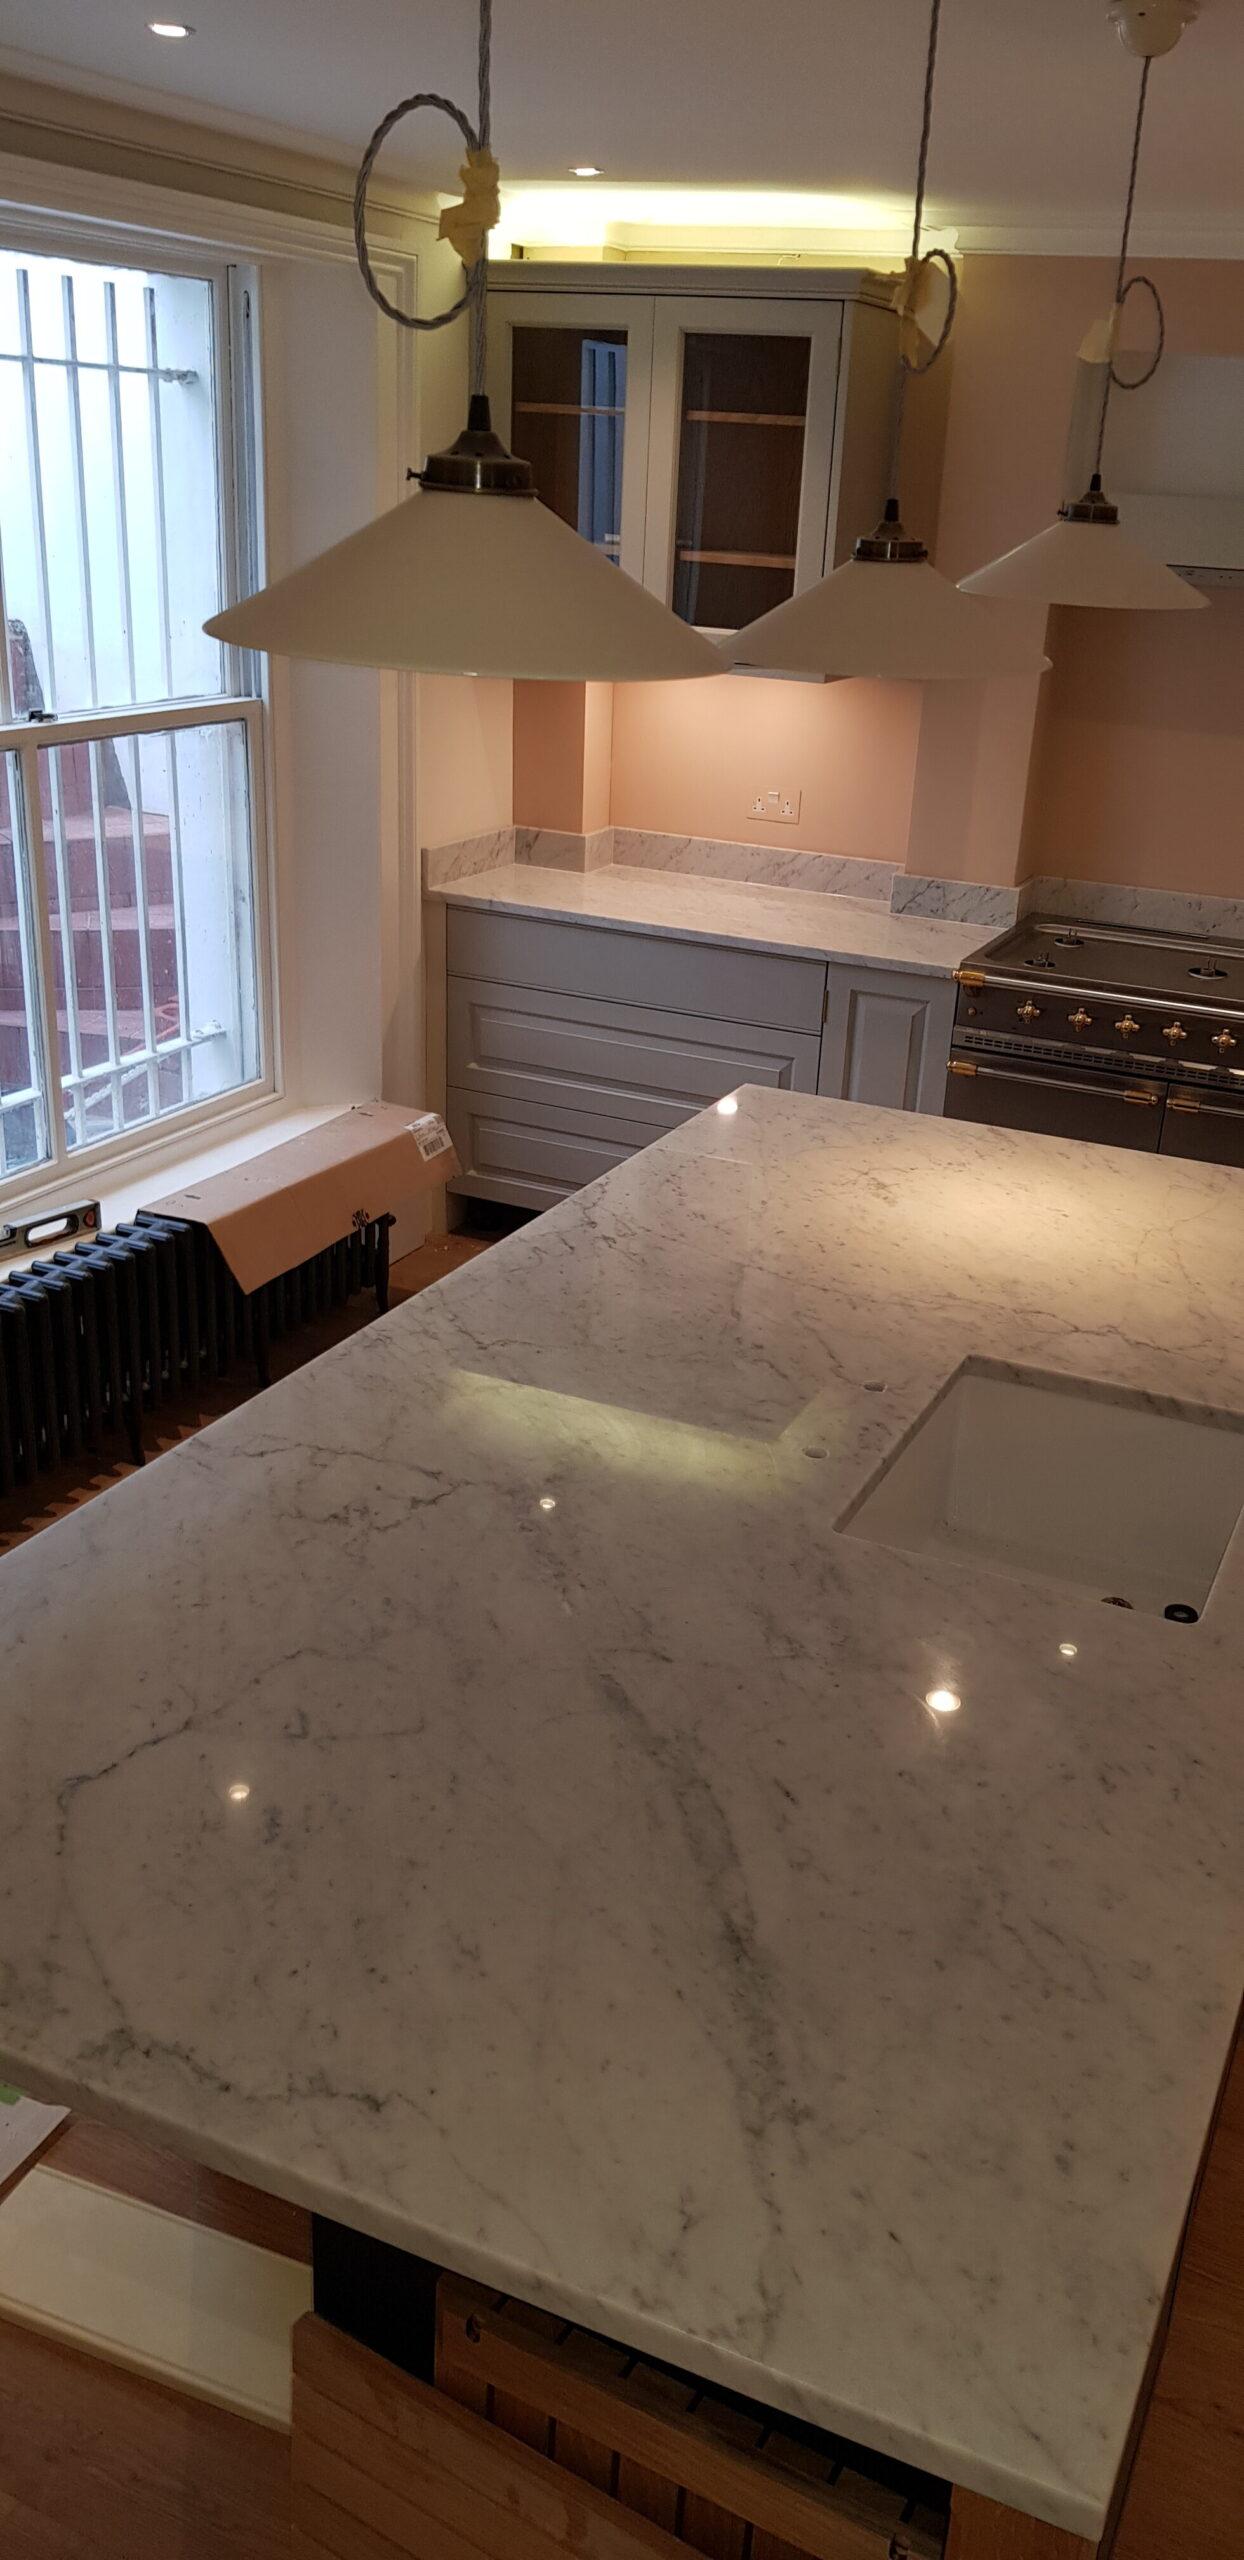 Refurbished kitchen stone worktops